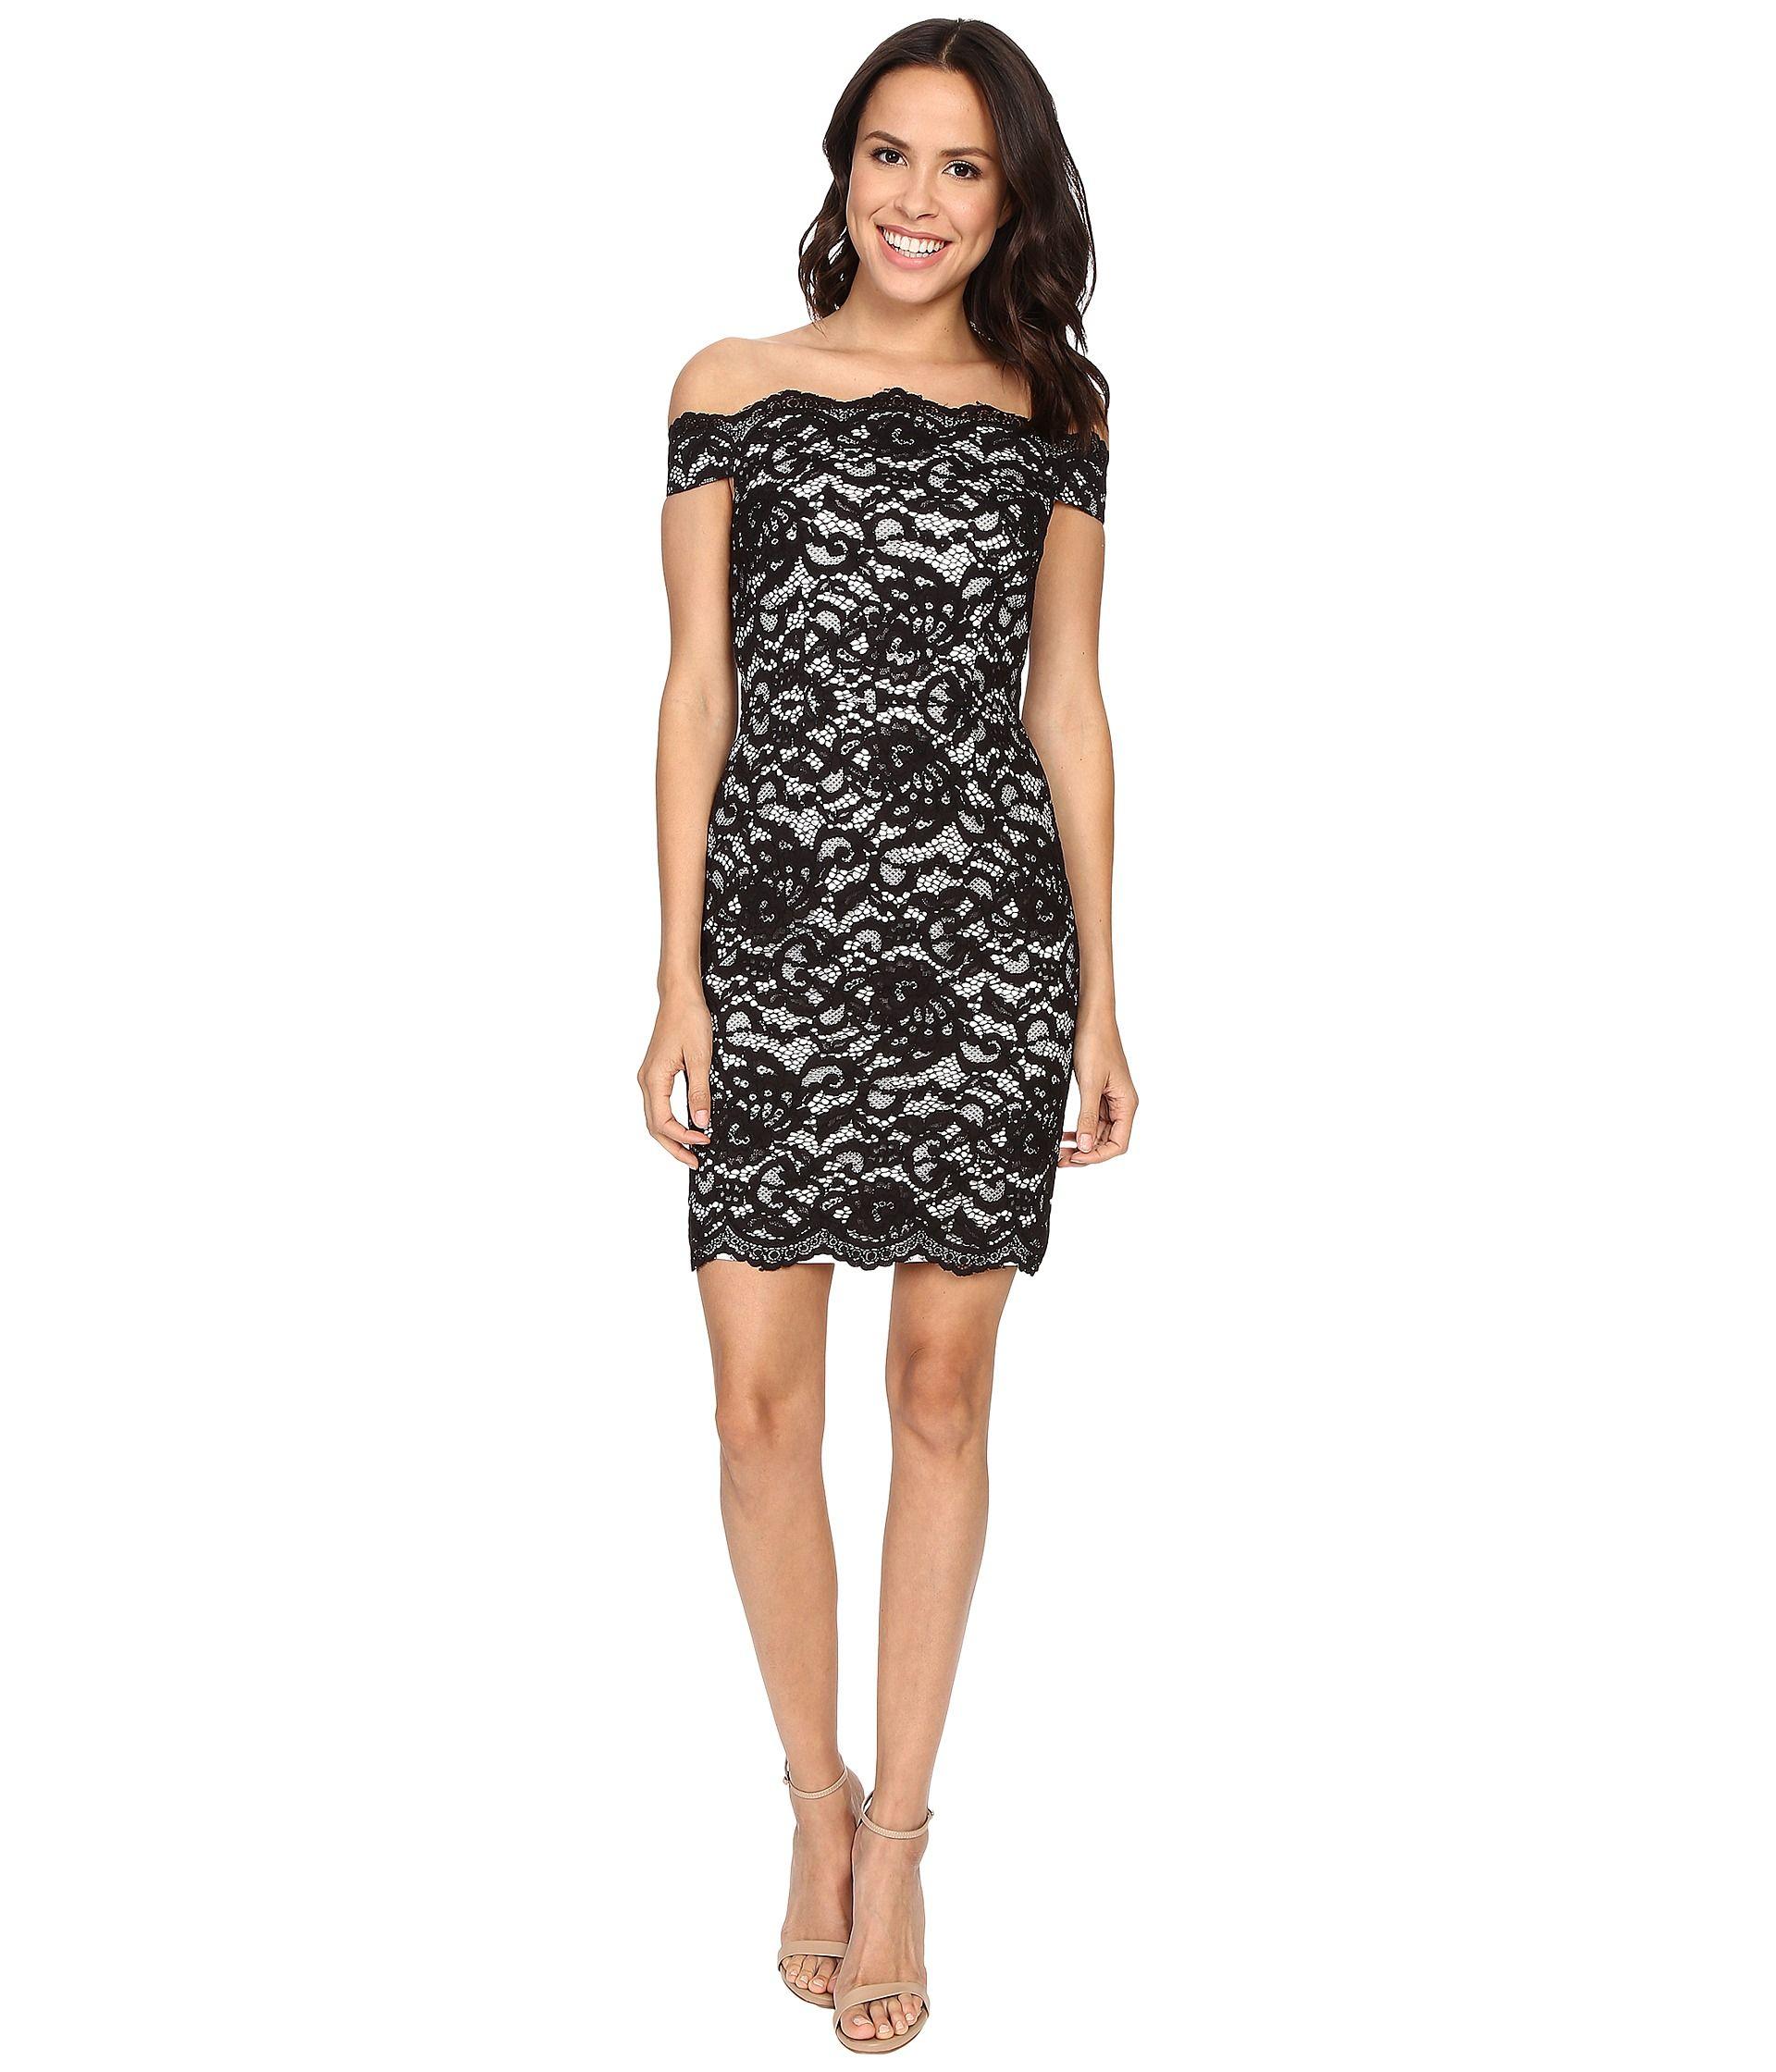 saree cocktail dress - Google Search   South Asian Fashion ...